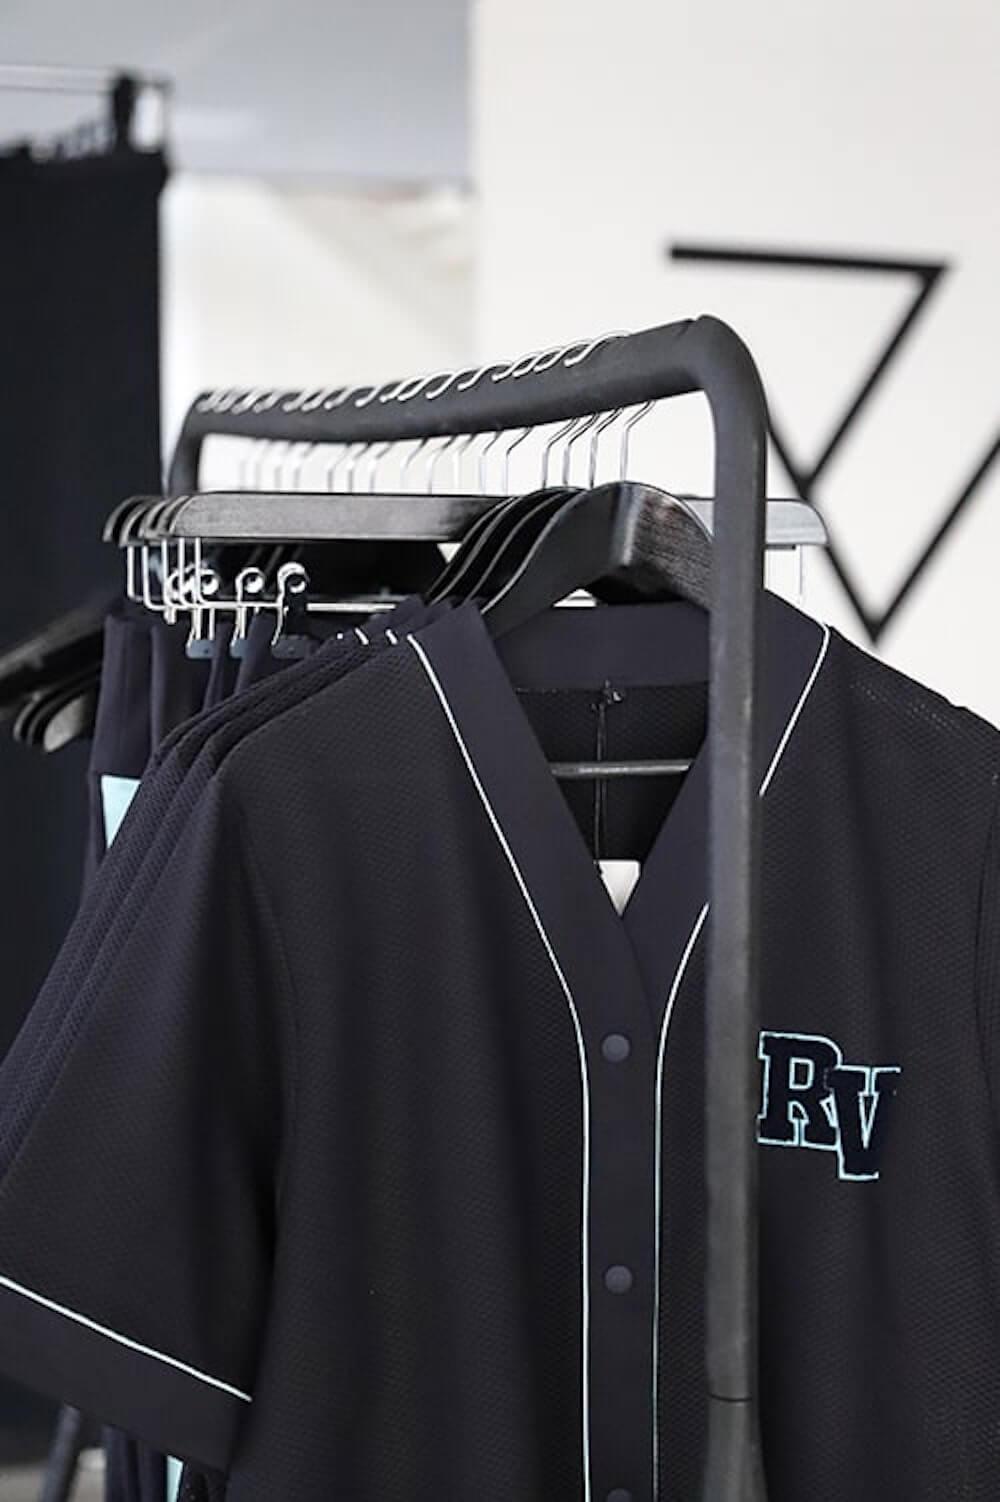 rv-showroom-neon-jersey-sportkledij